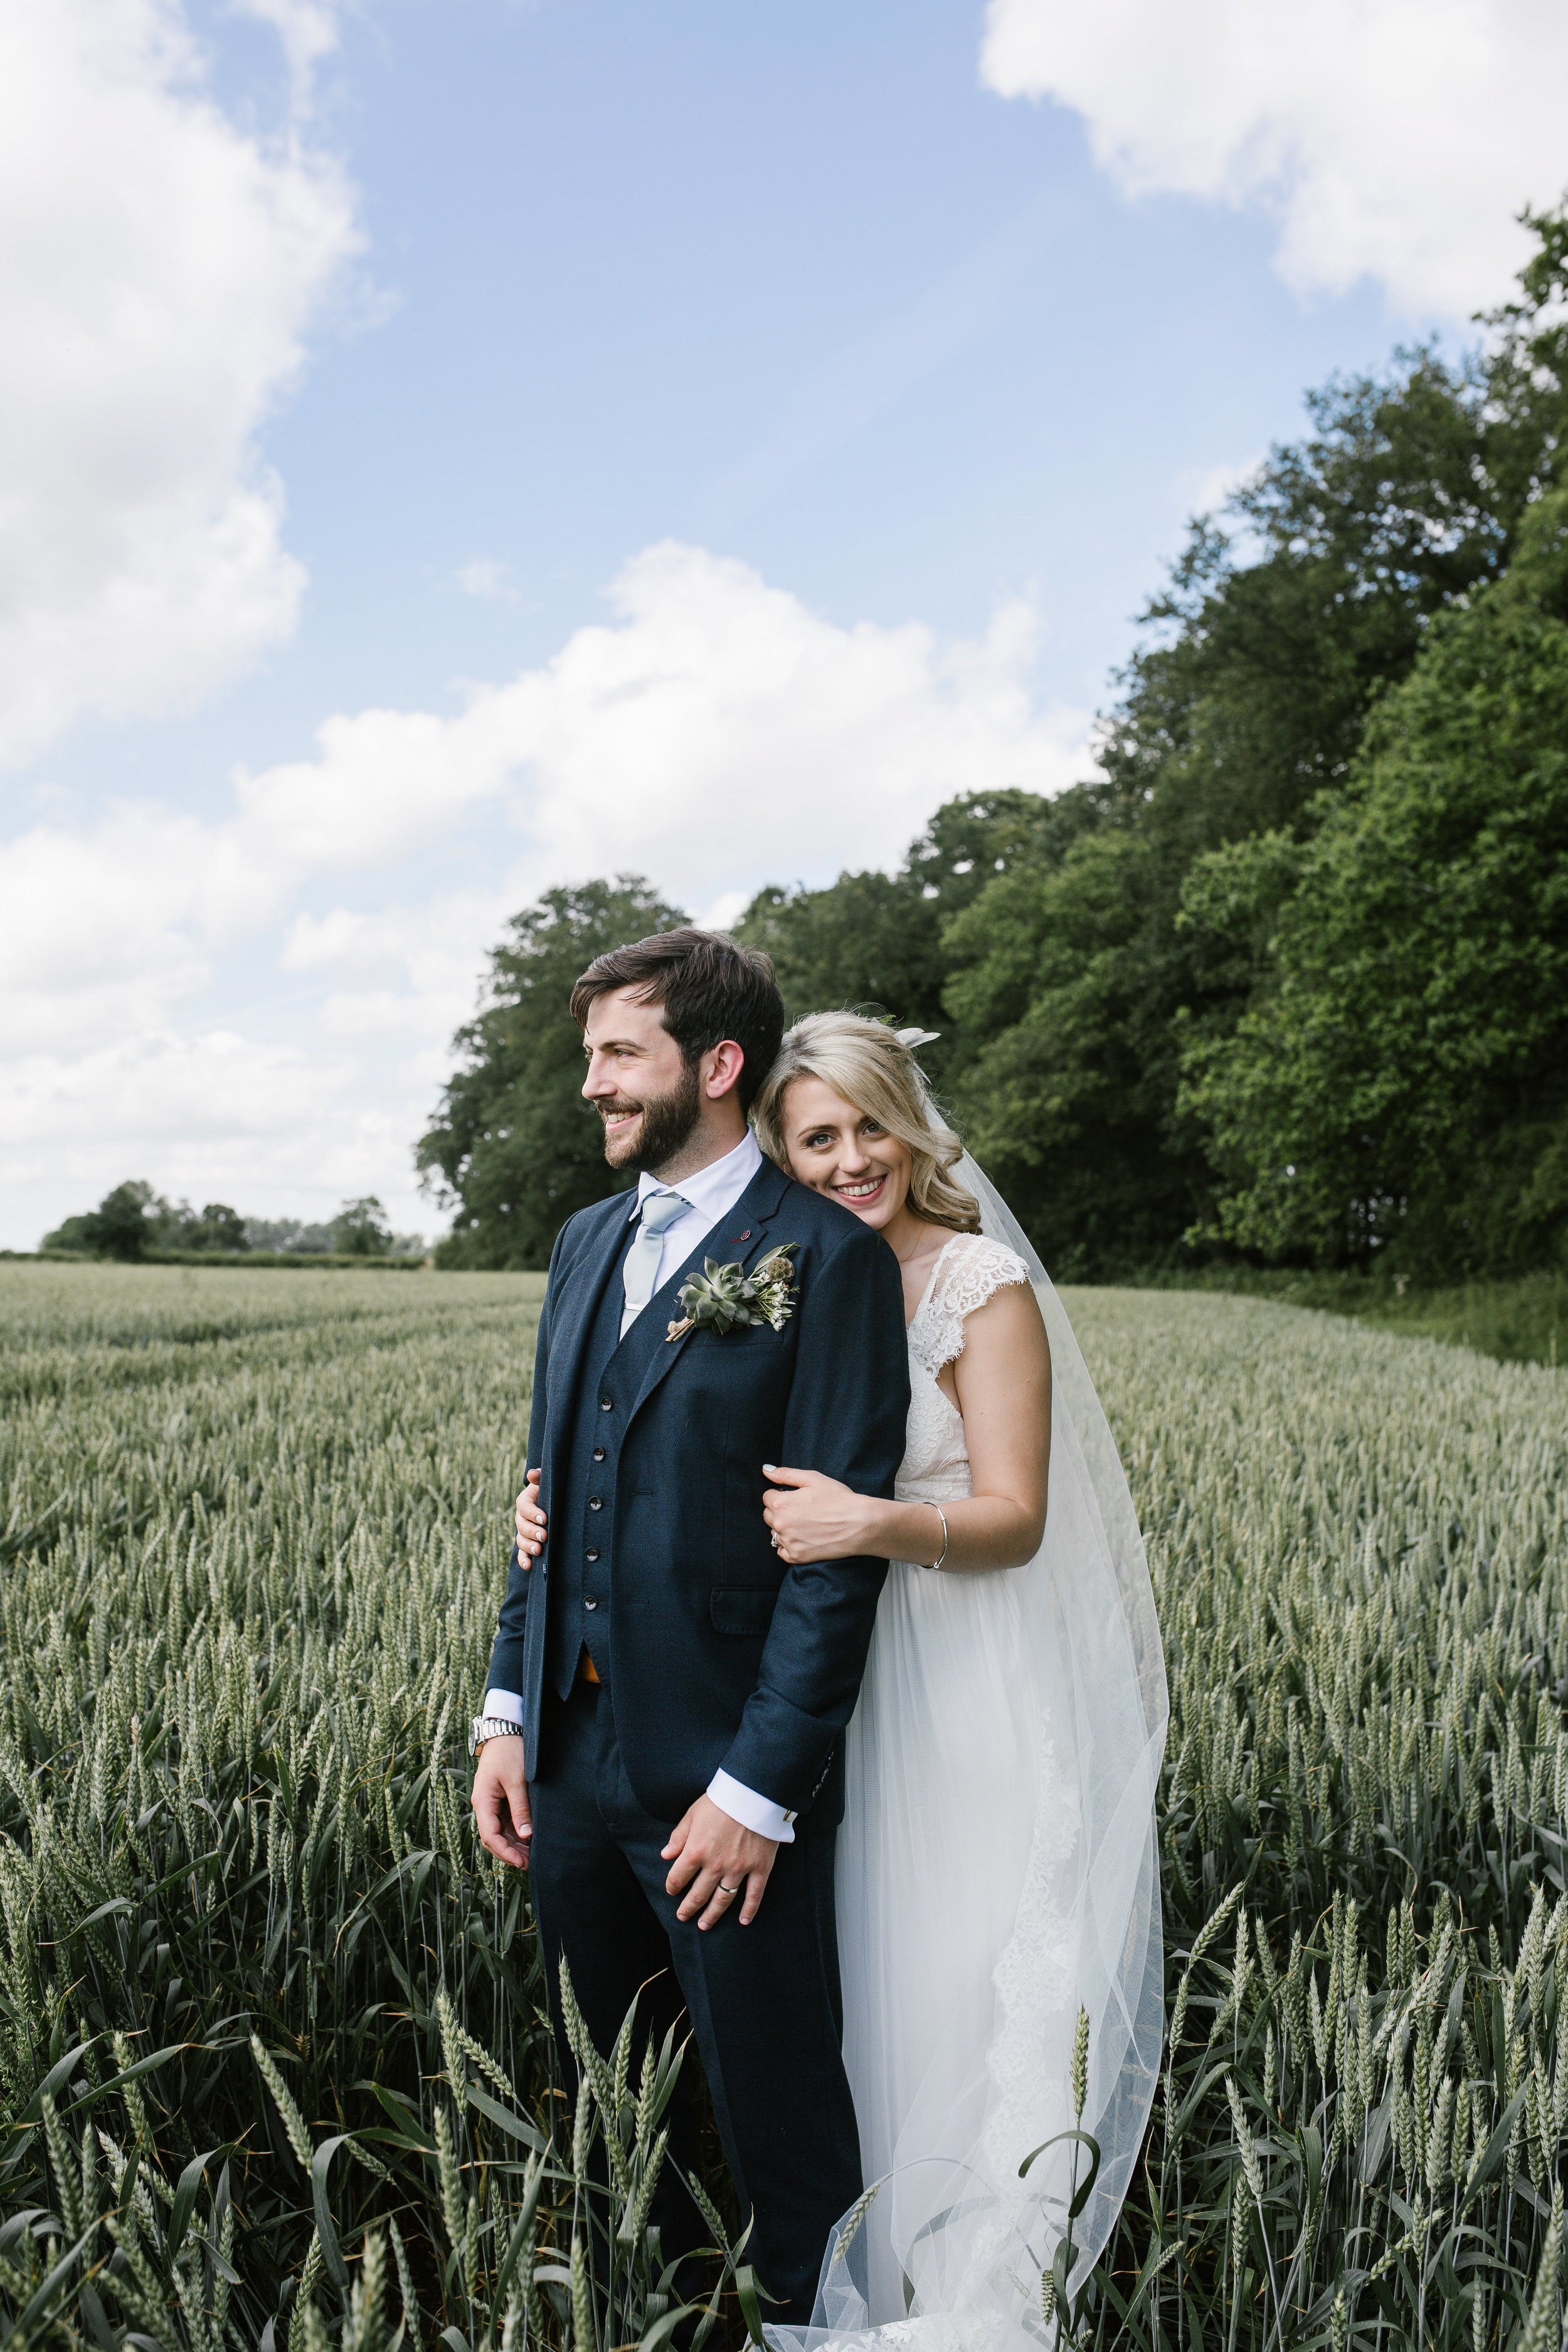 Cotswolds wedding, cotswolds wedding photographer, DIY wedding, forest wedding, marquee wedding, fun wedding, alternative wedding-283.jpg